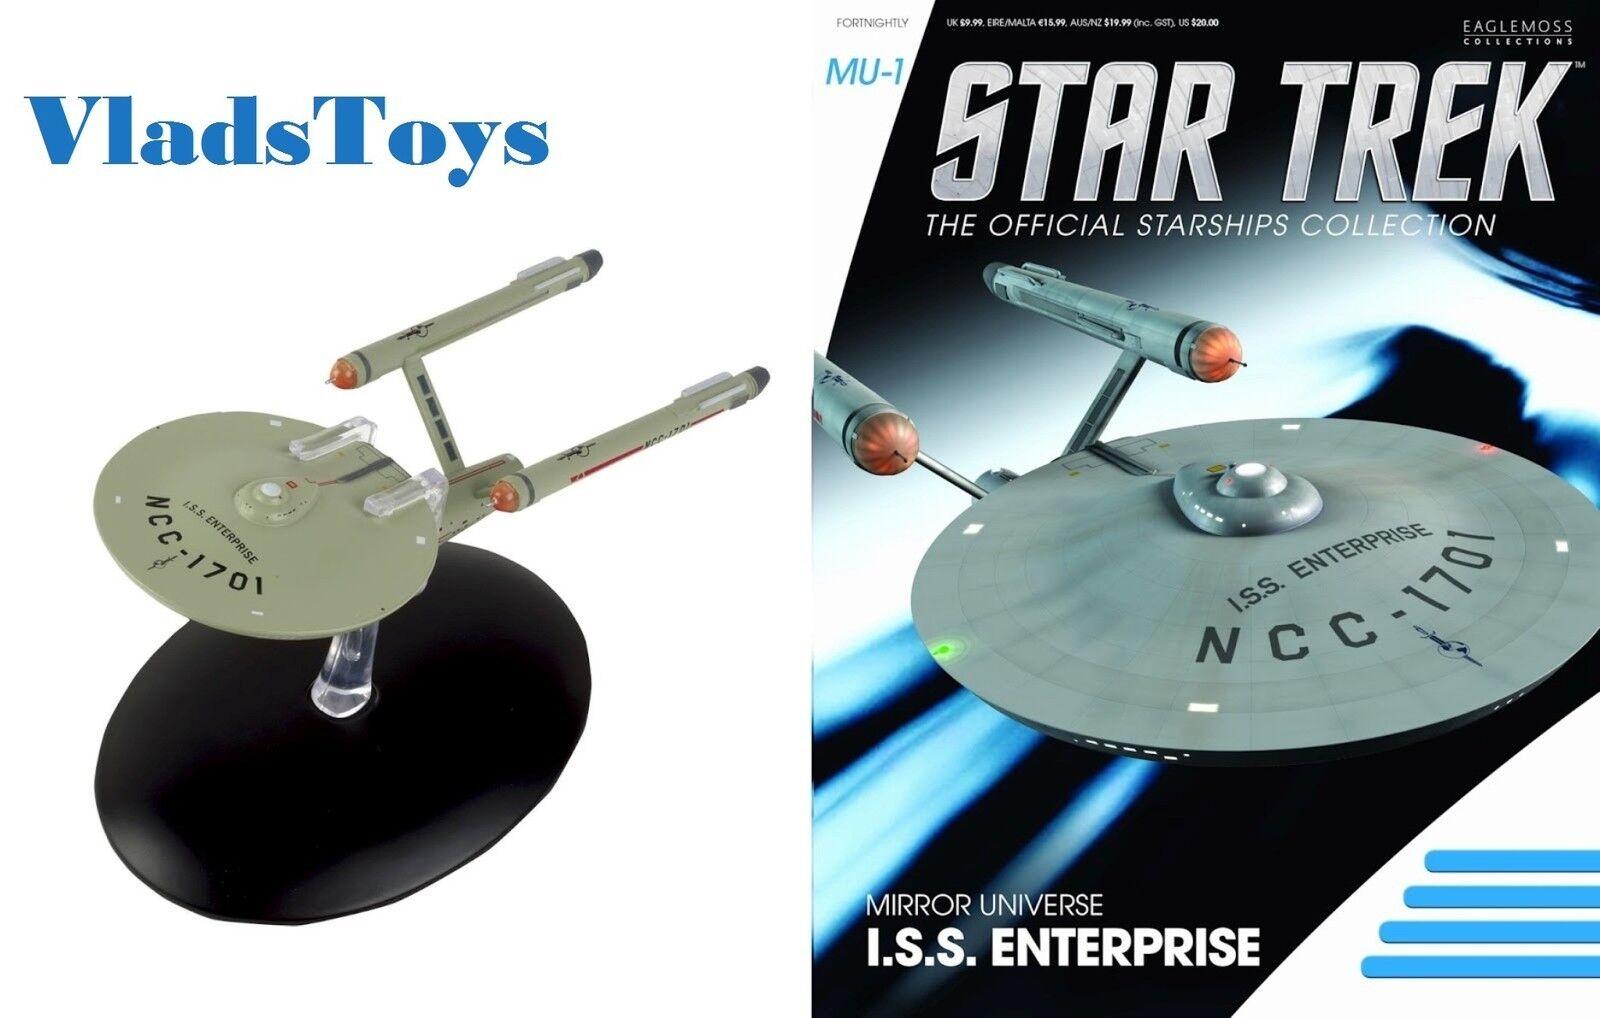 Eaglemoss Star Trek ISS Enterprise NCC-1701 Mirror Universe  M1 with magazine